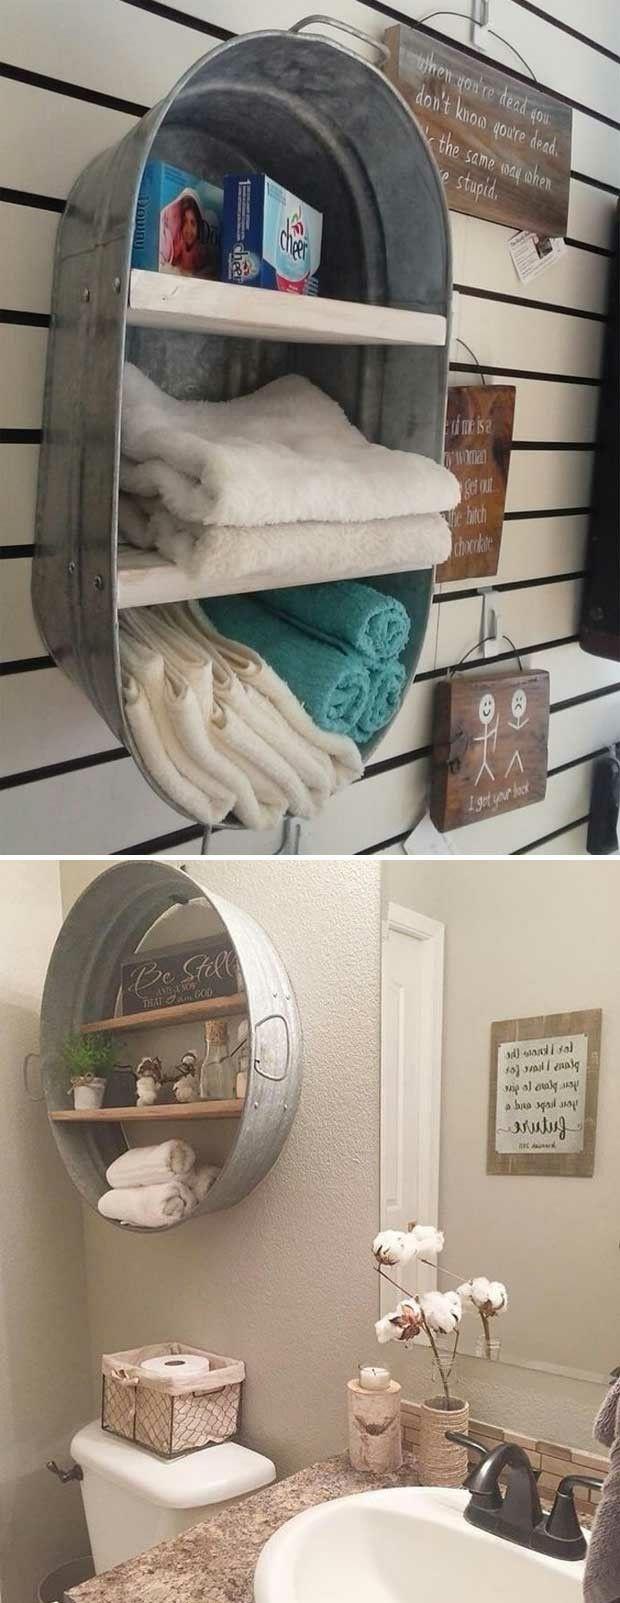 Bathroom interior design and remodeling   Brico-déco   Pinterest ...